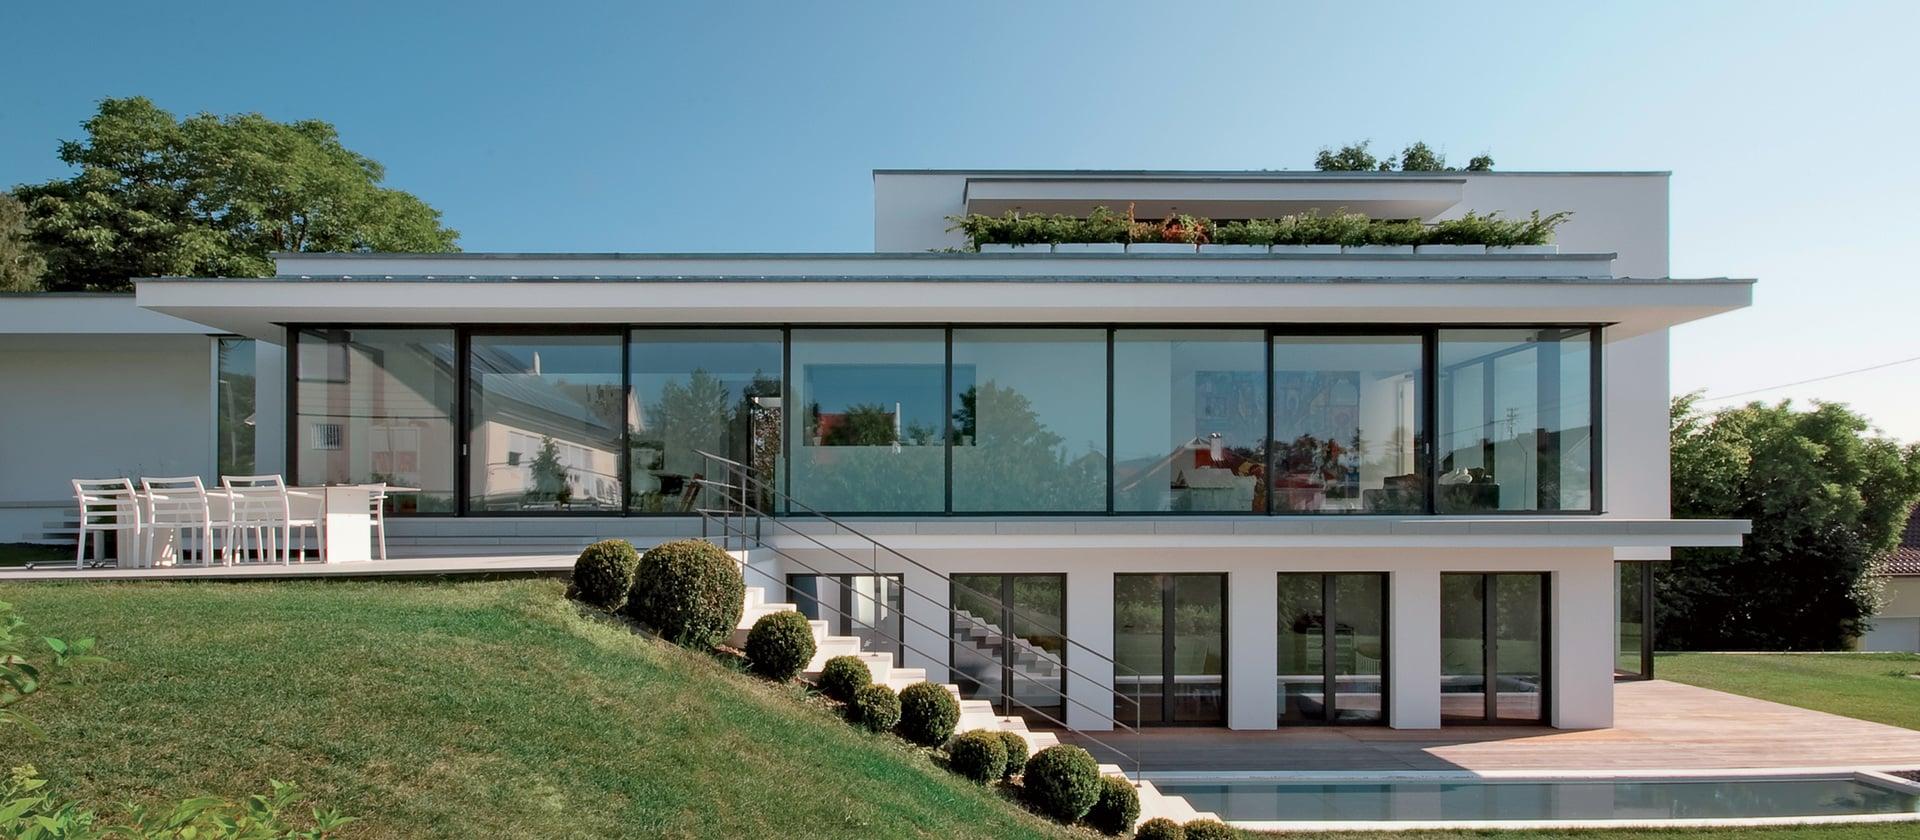 Maison d'habitation en Bade-Wurtemberg